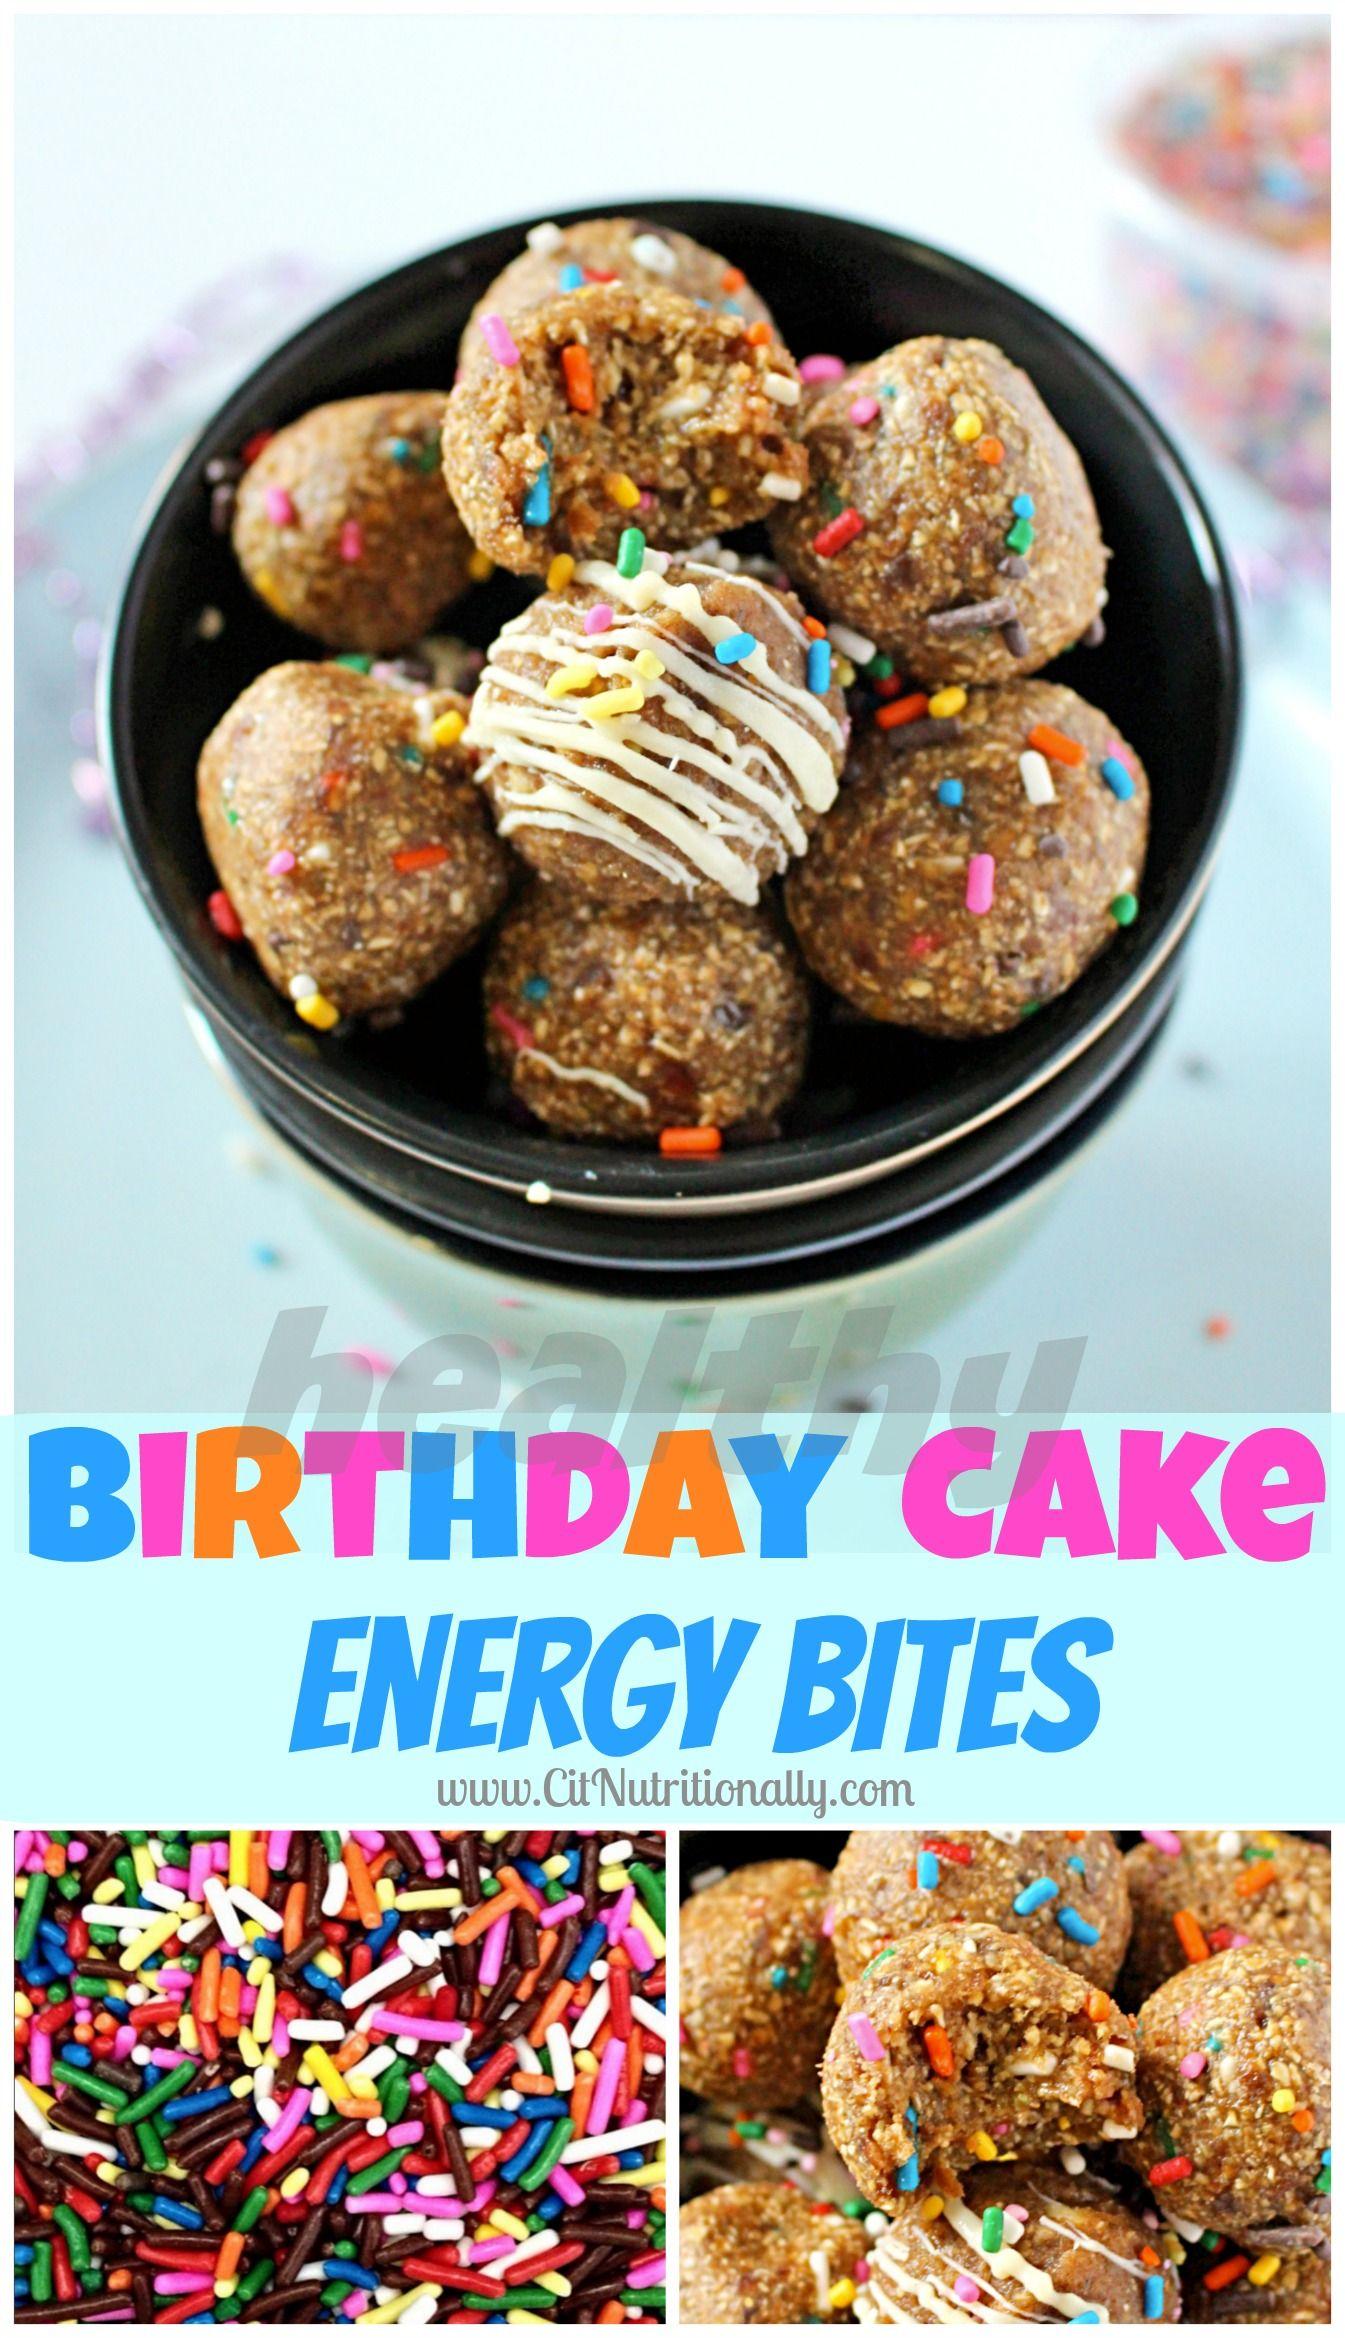 Healthy birthday cake energy bites recipe healthy